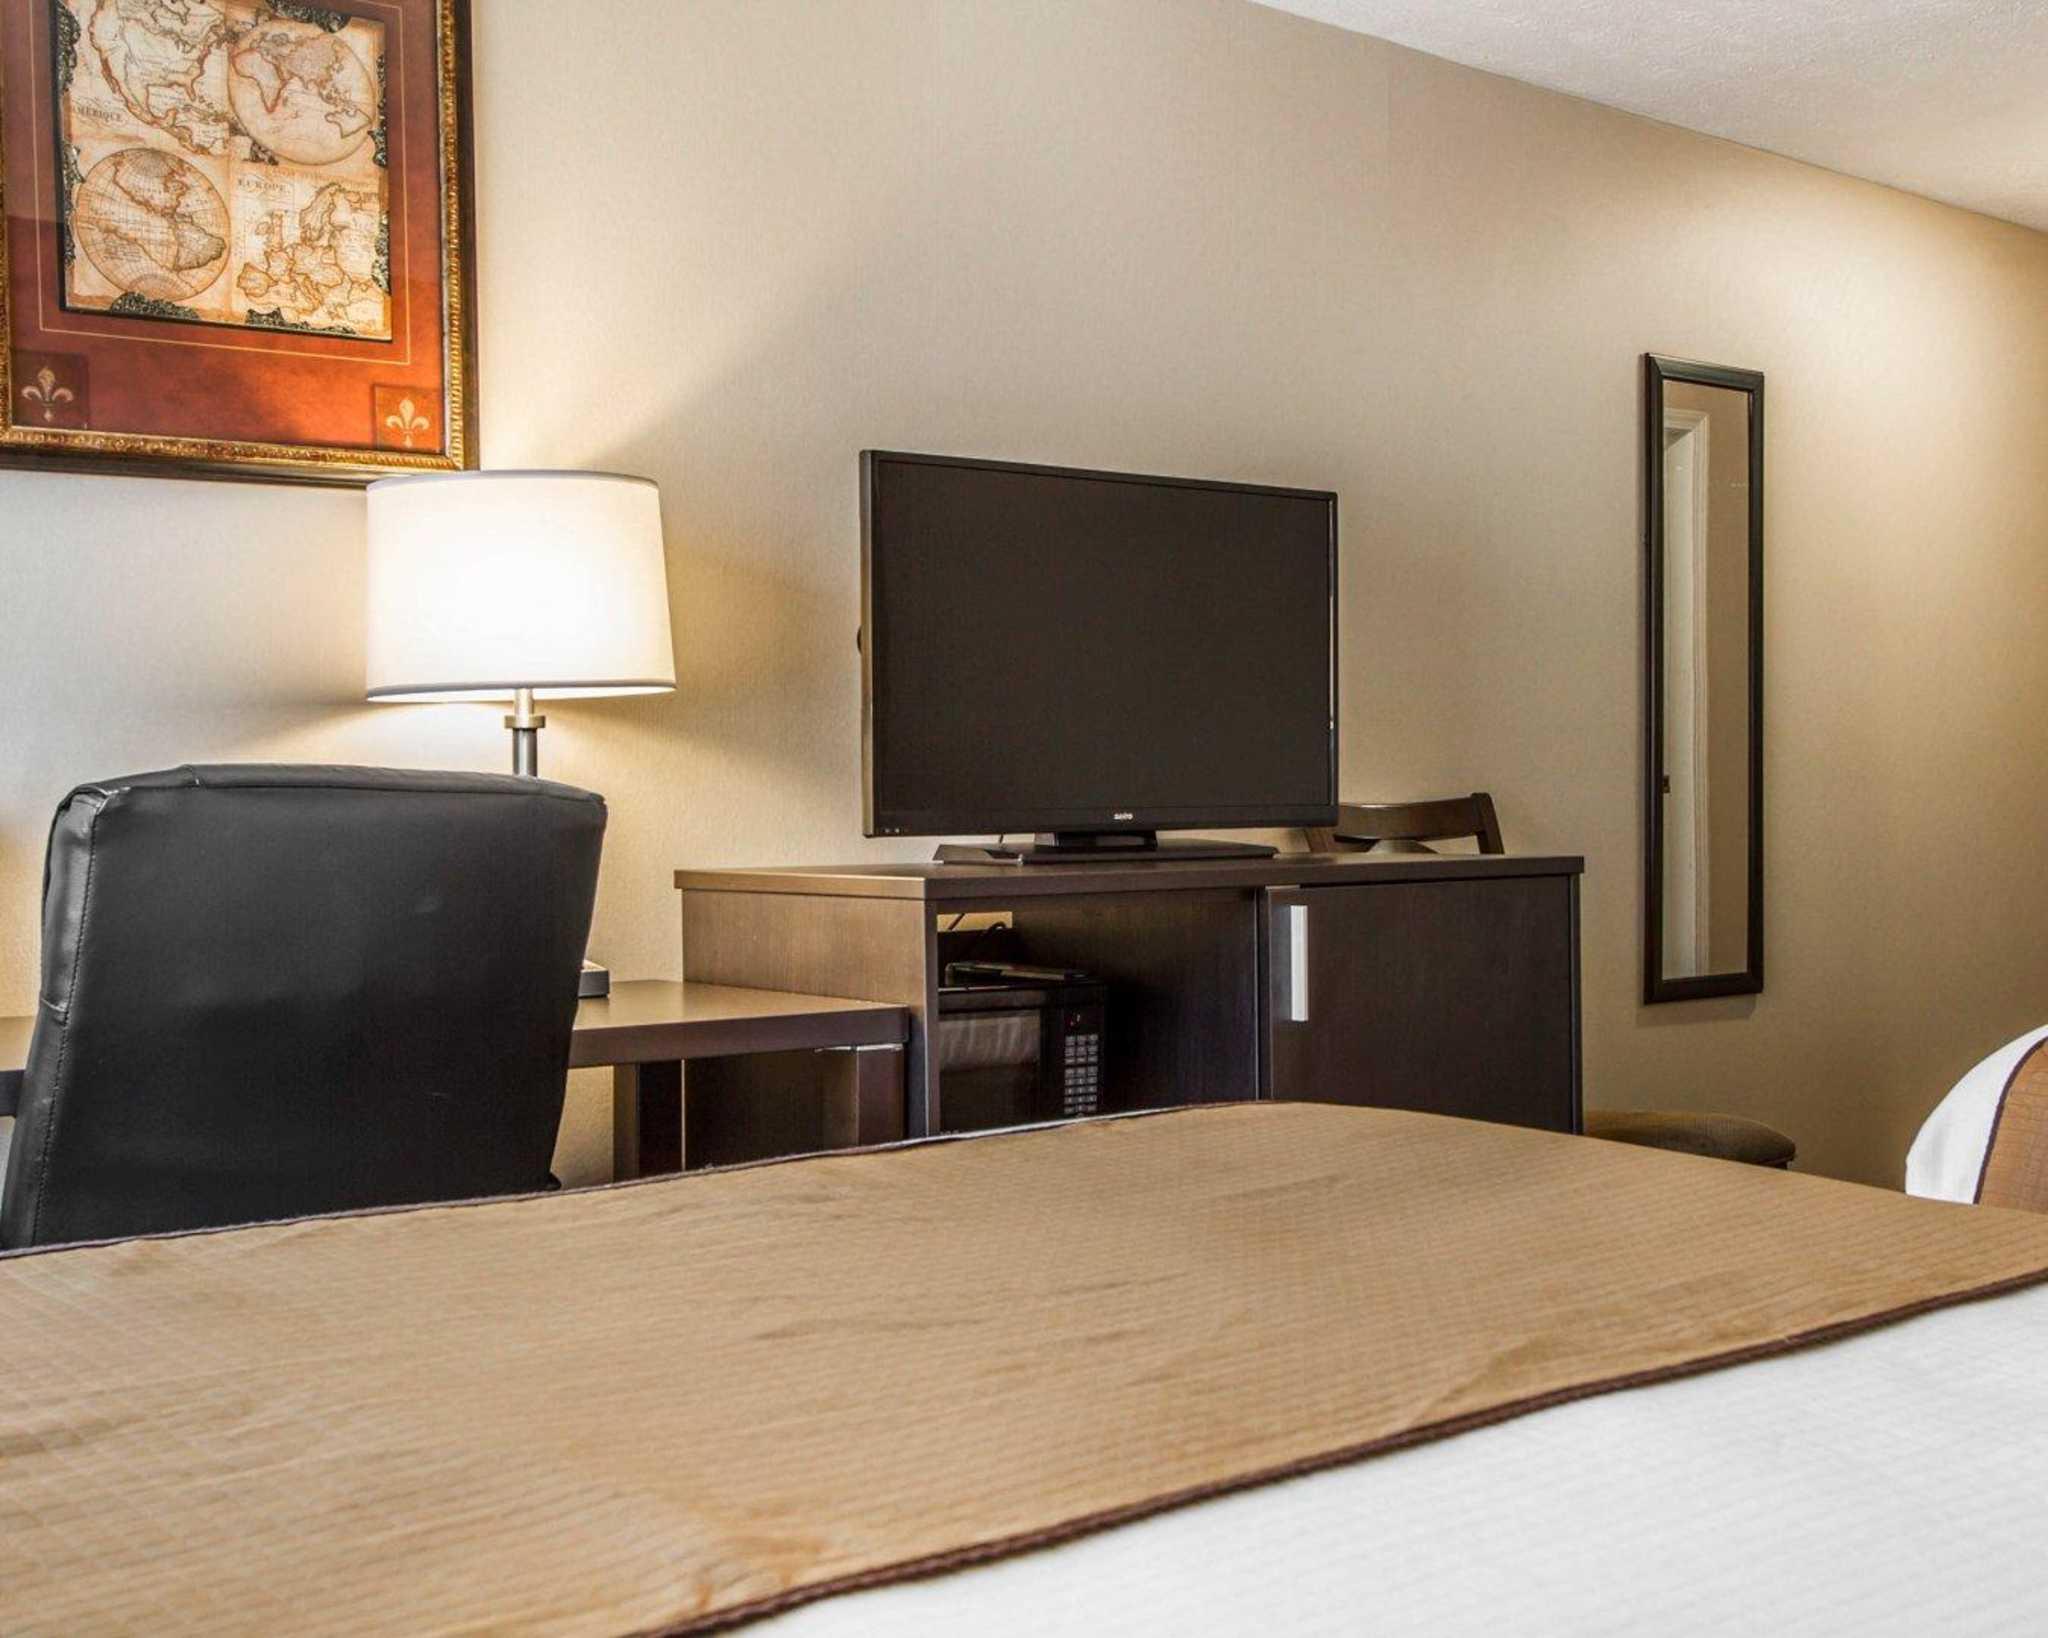 Quality Inn & Suites image 9